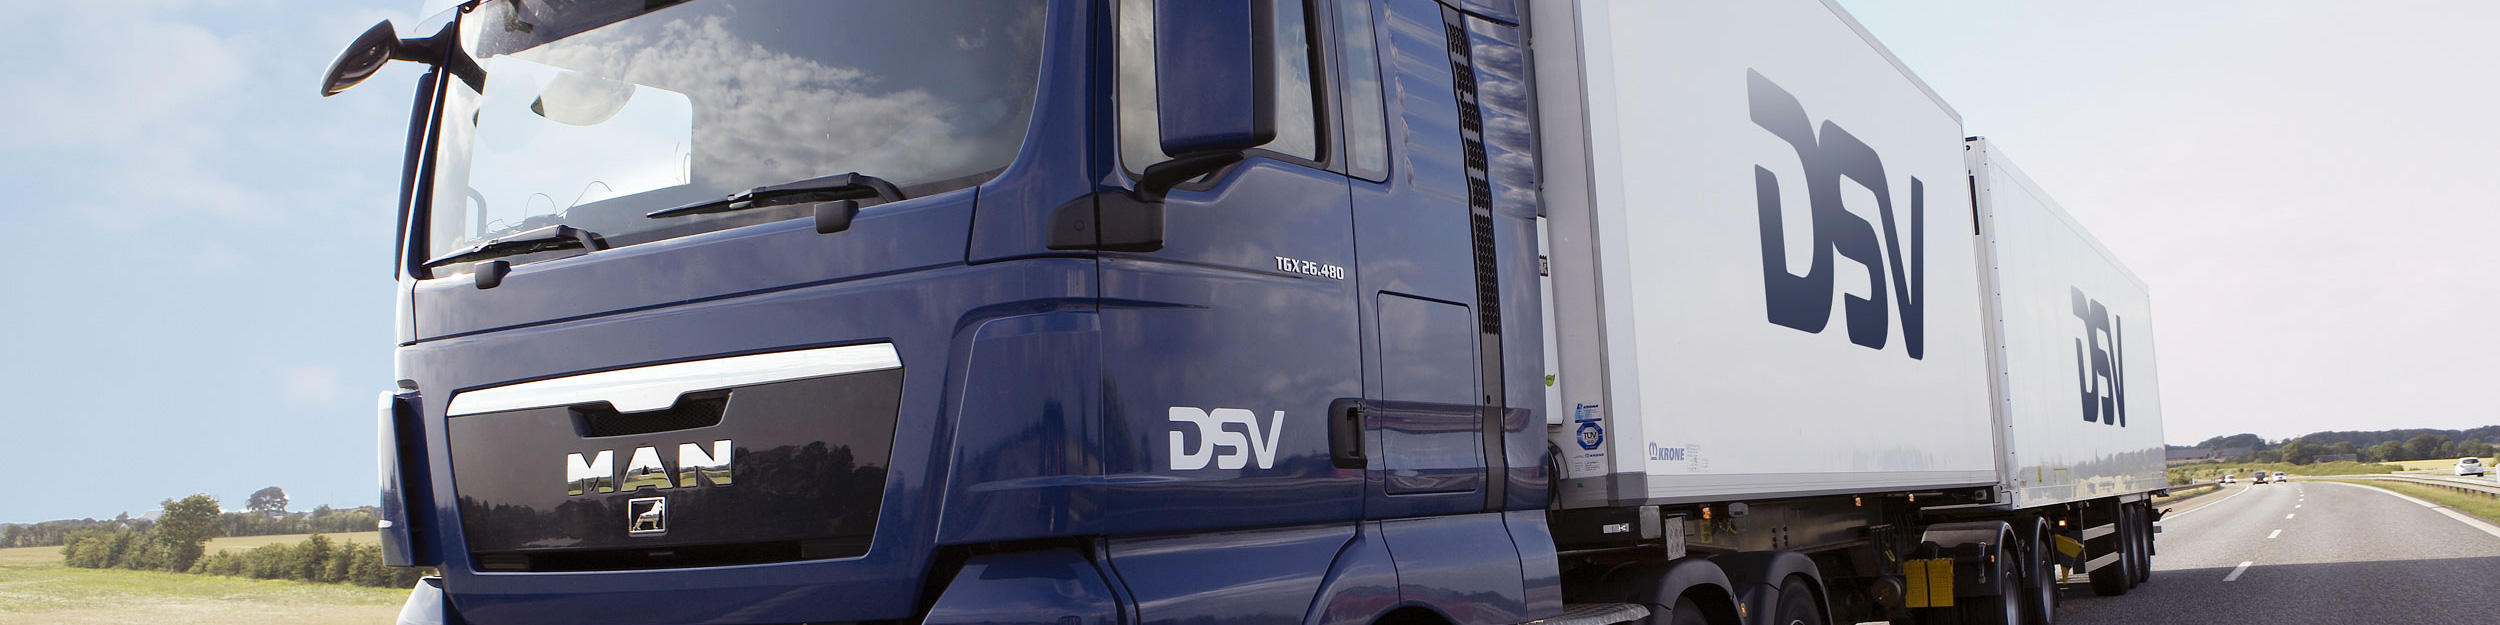 DSV lastbil